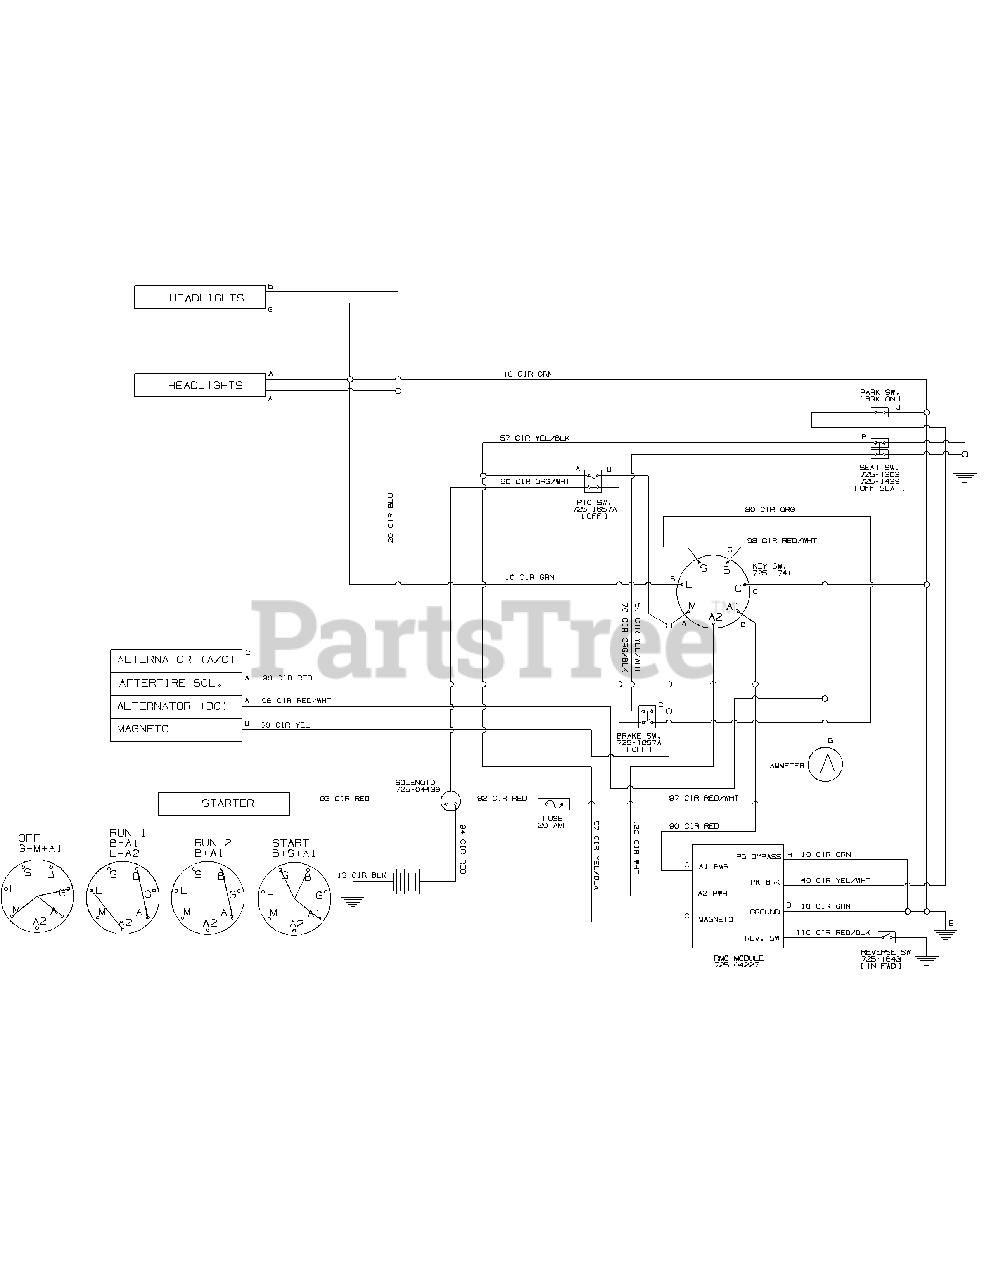 J26 Troy Bilt Wiring Diagram - seniorsclub.it electrical-drown - electrical -drown.seniorsclub.it | Battery For Apc Smart Ups 300rm Wiring Diagram |  | electrical-drown.seniorsclub.it